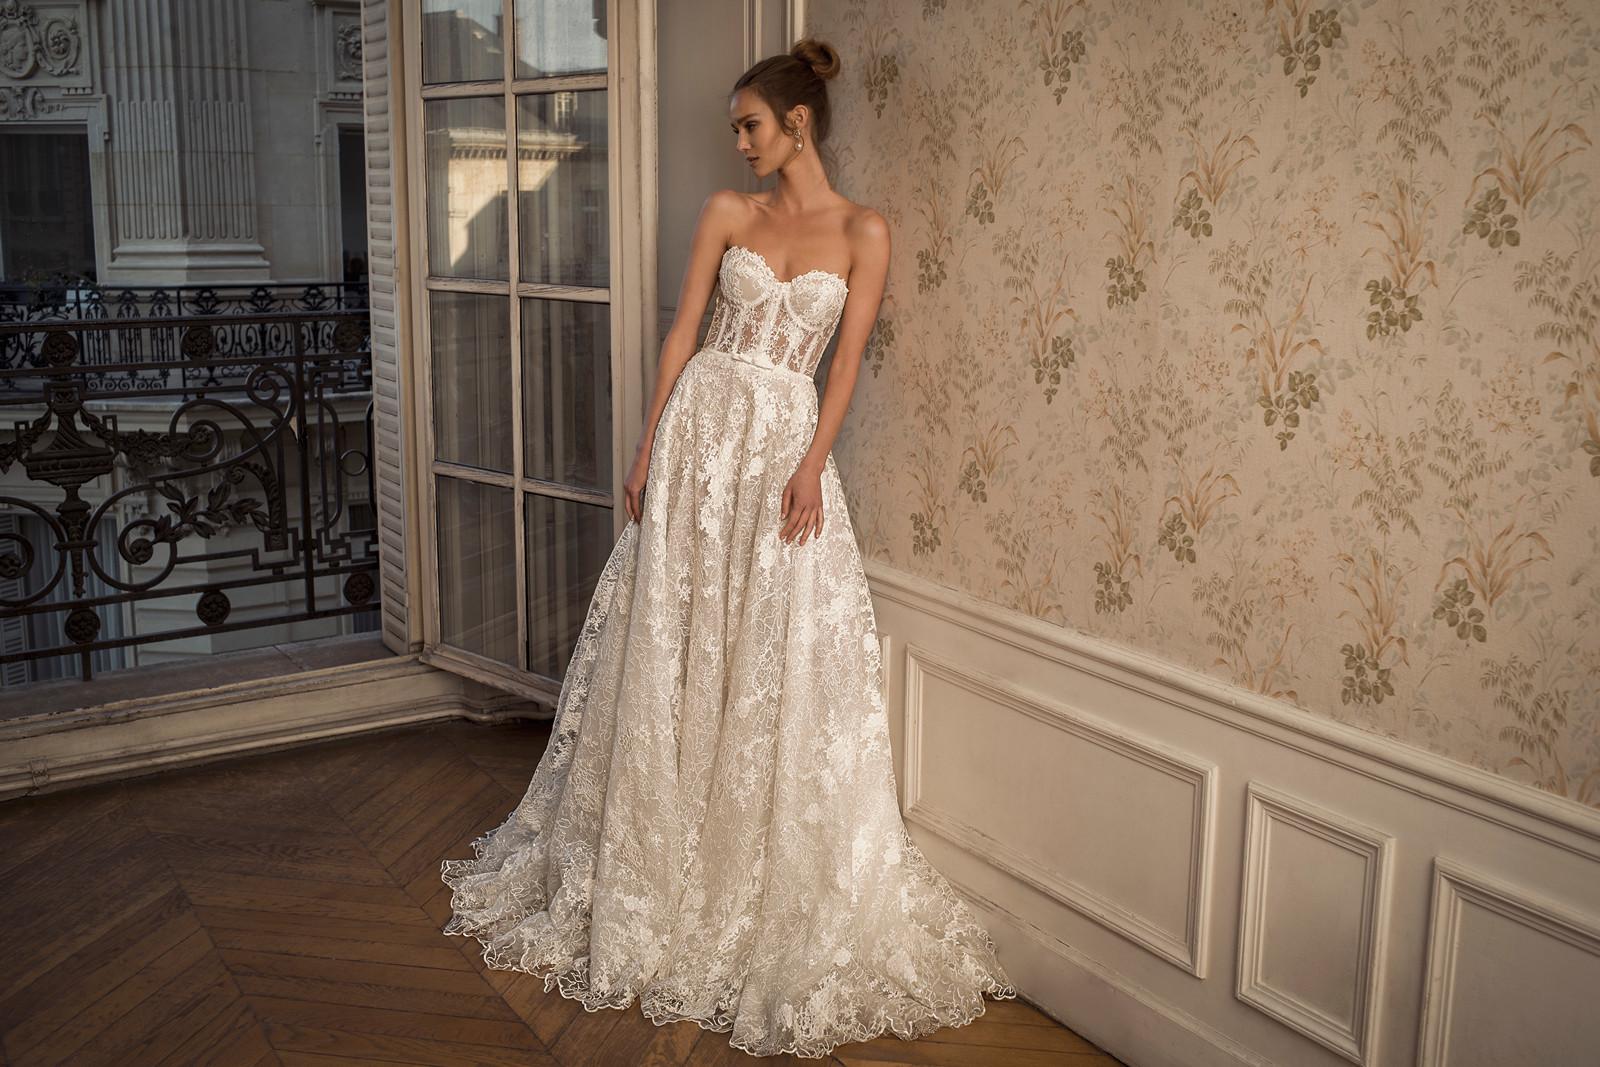 Mira Couture Netta Benshabu Symon Wedding Dress Bridal Gown Israeli Designer Chicago Boutique3